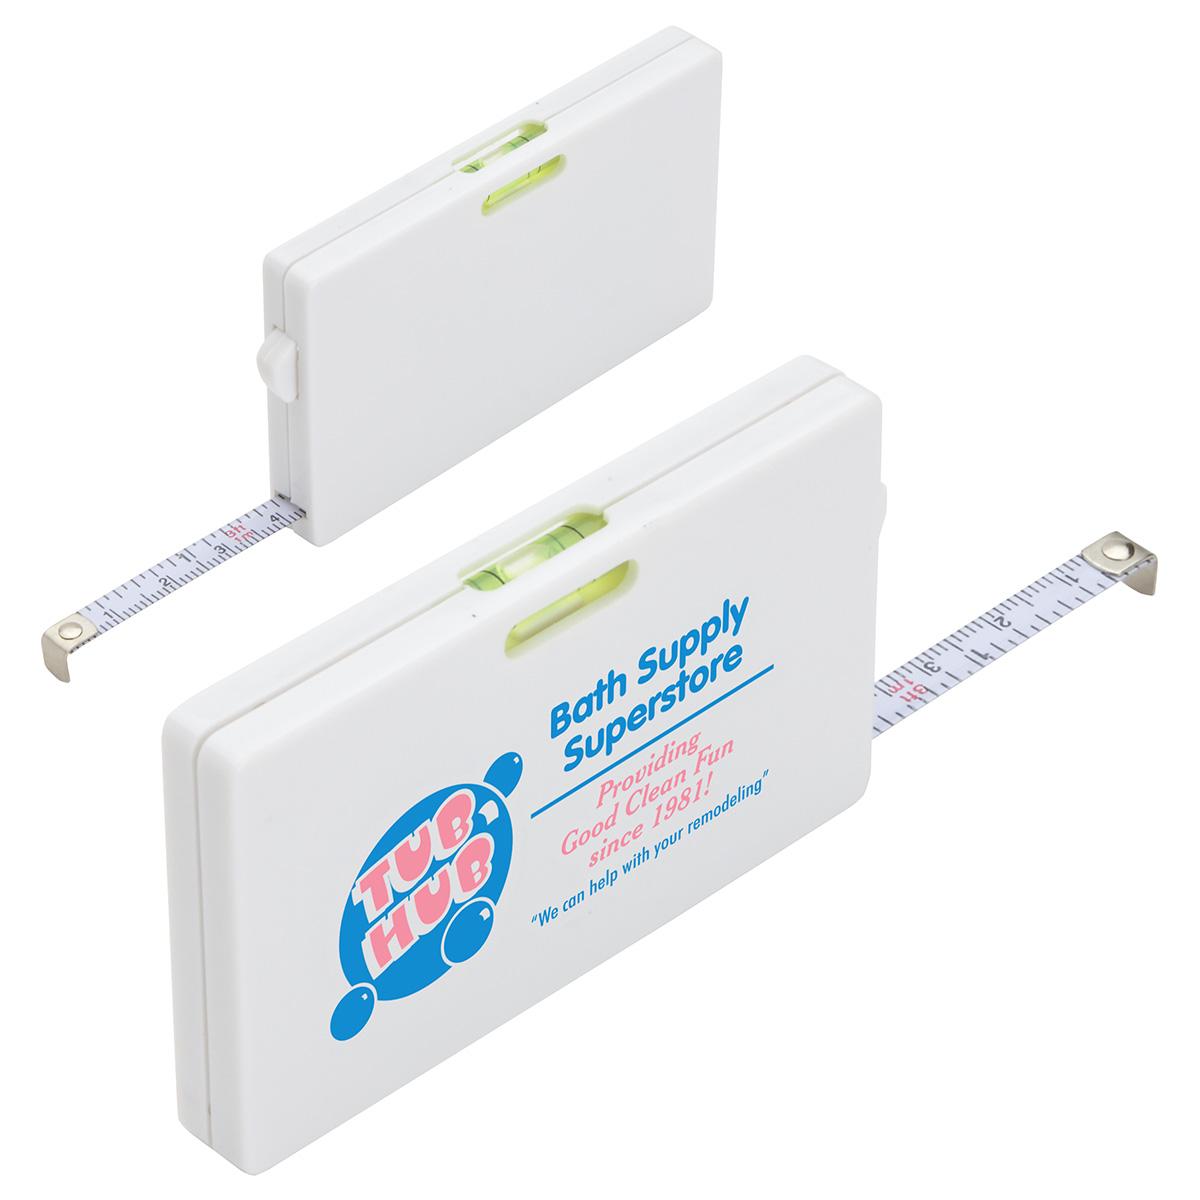 Tape Measure Card w/ Level Indicator, WTT-TC20 - 1 Colour Imprint